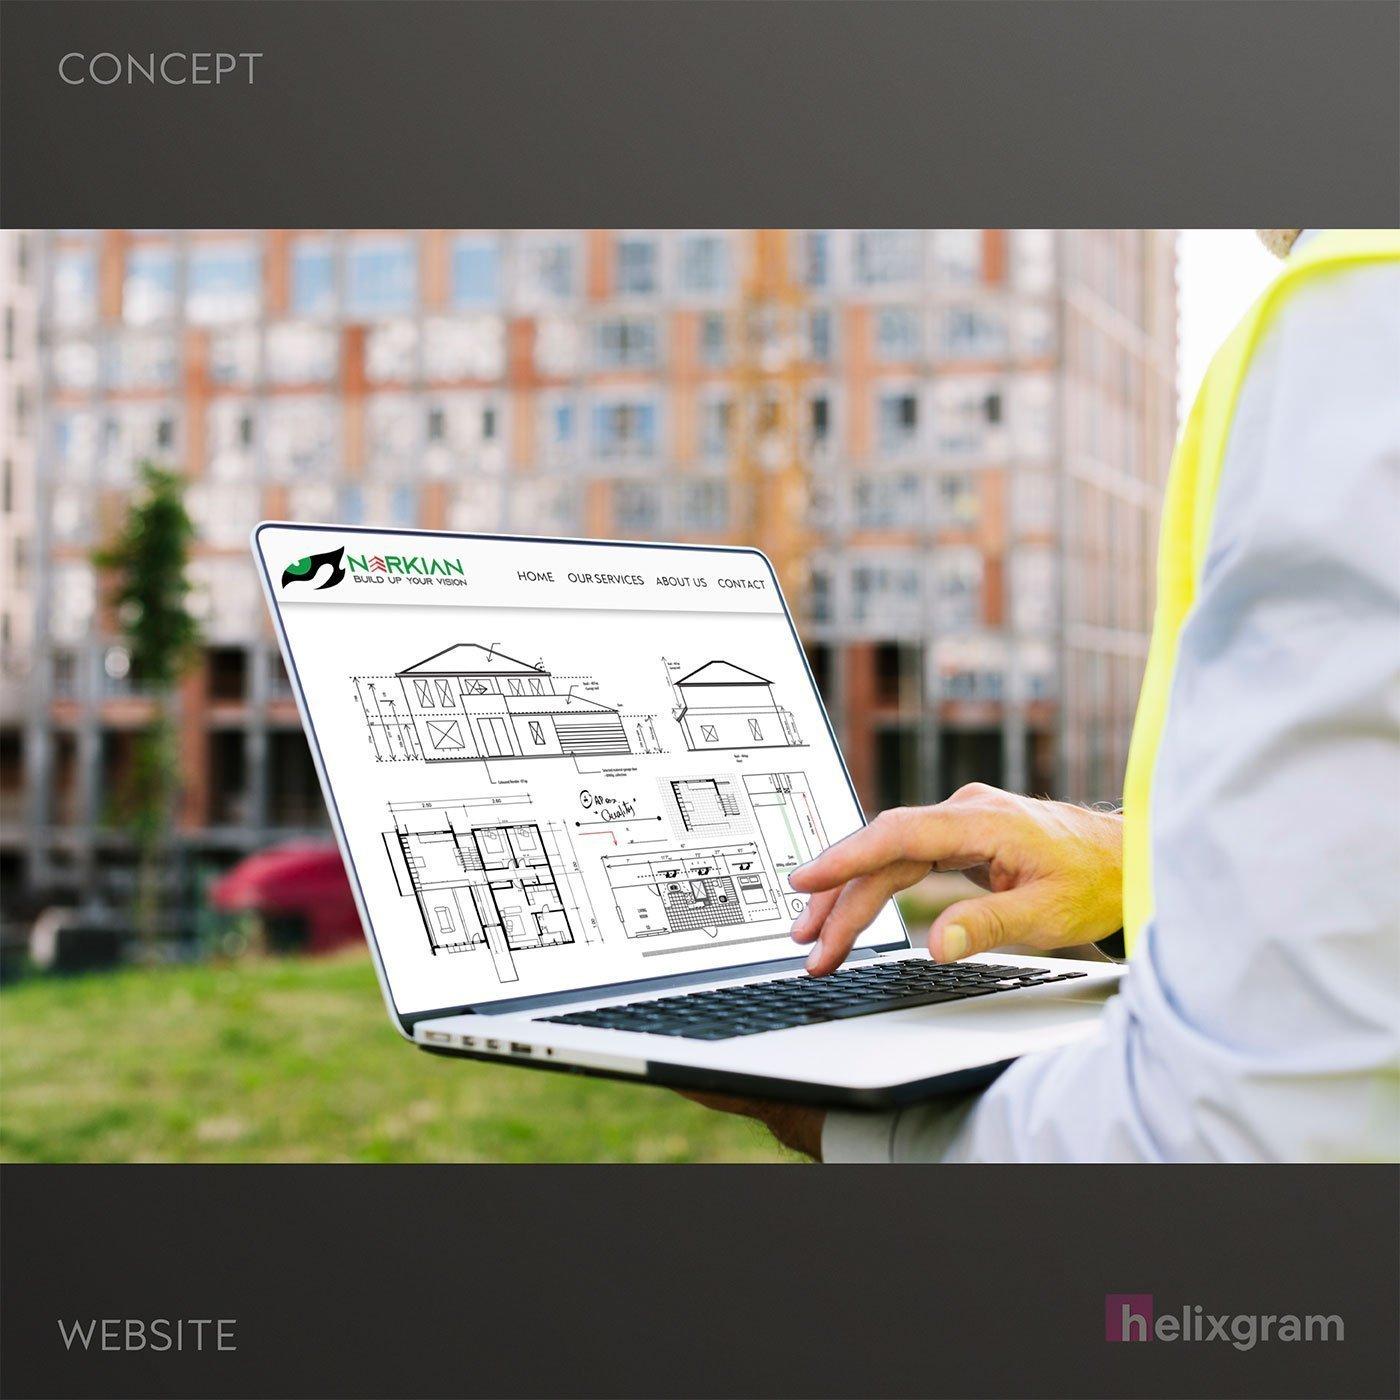 Brand-Identity-Design-Website-Design-Narkian-design-visual-identity-design-package-corporate-identity-design-logo-design-flyer-poster-book-cover-design-web-design-digital-advertising-Helixgram